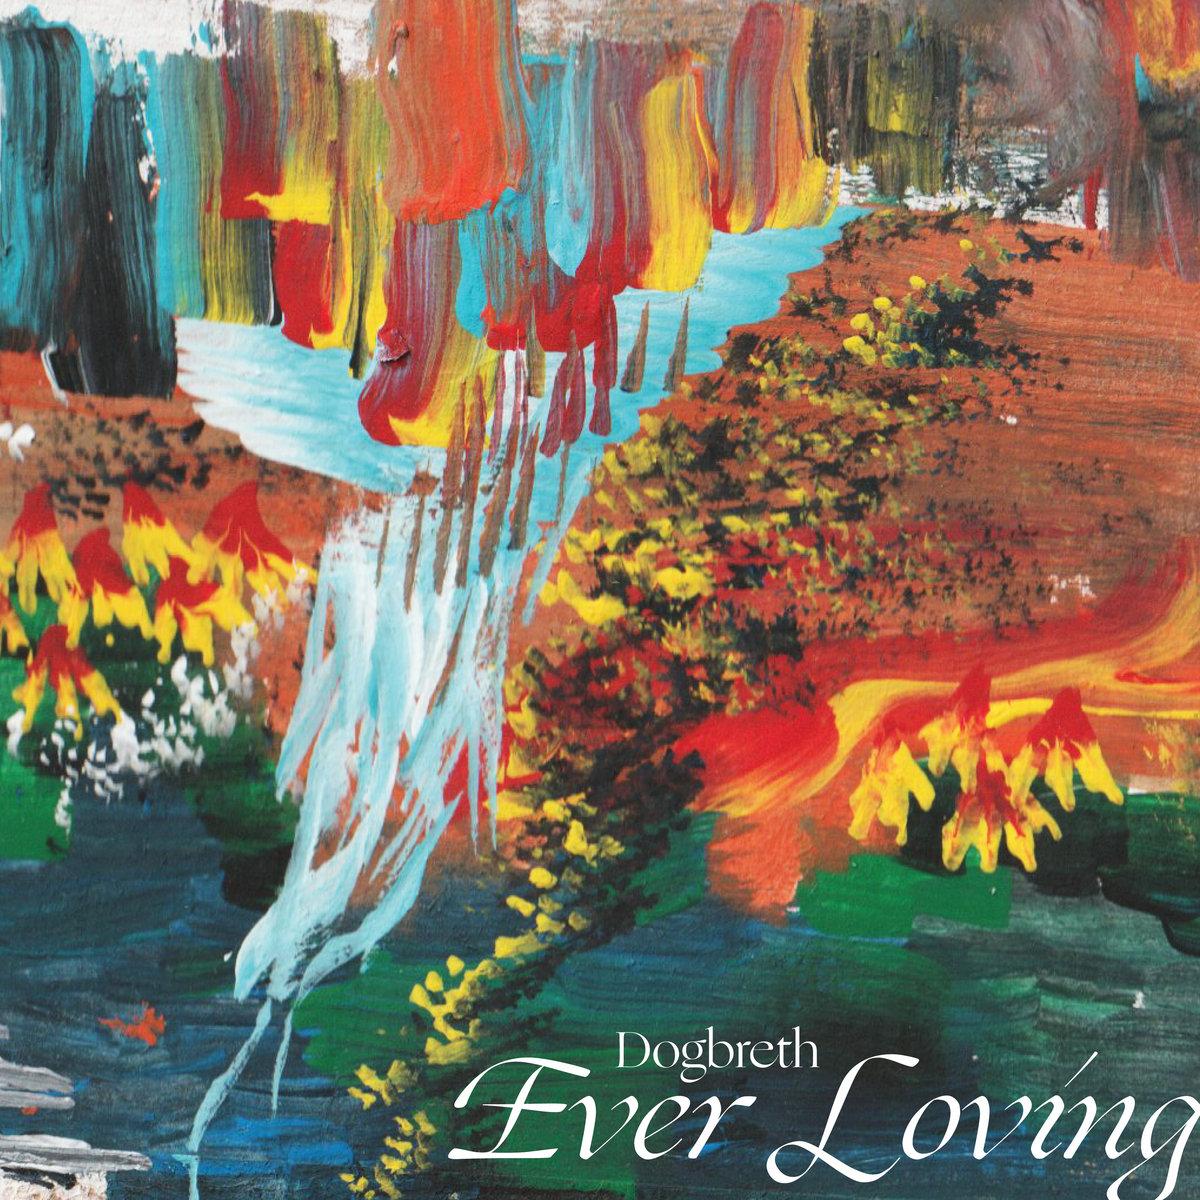 Dogbreth - Ever Loving LP